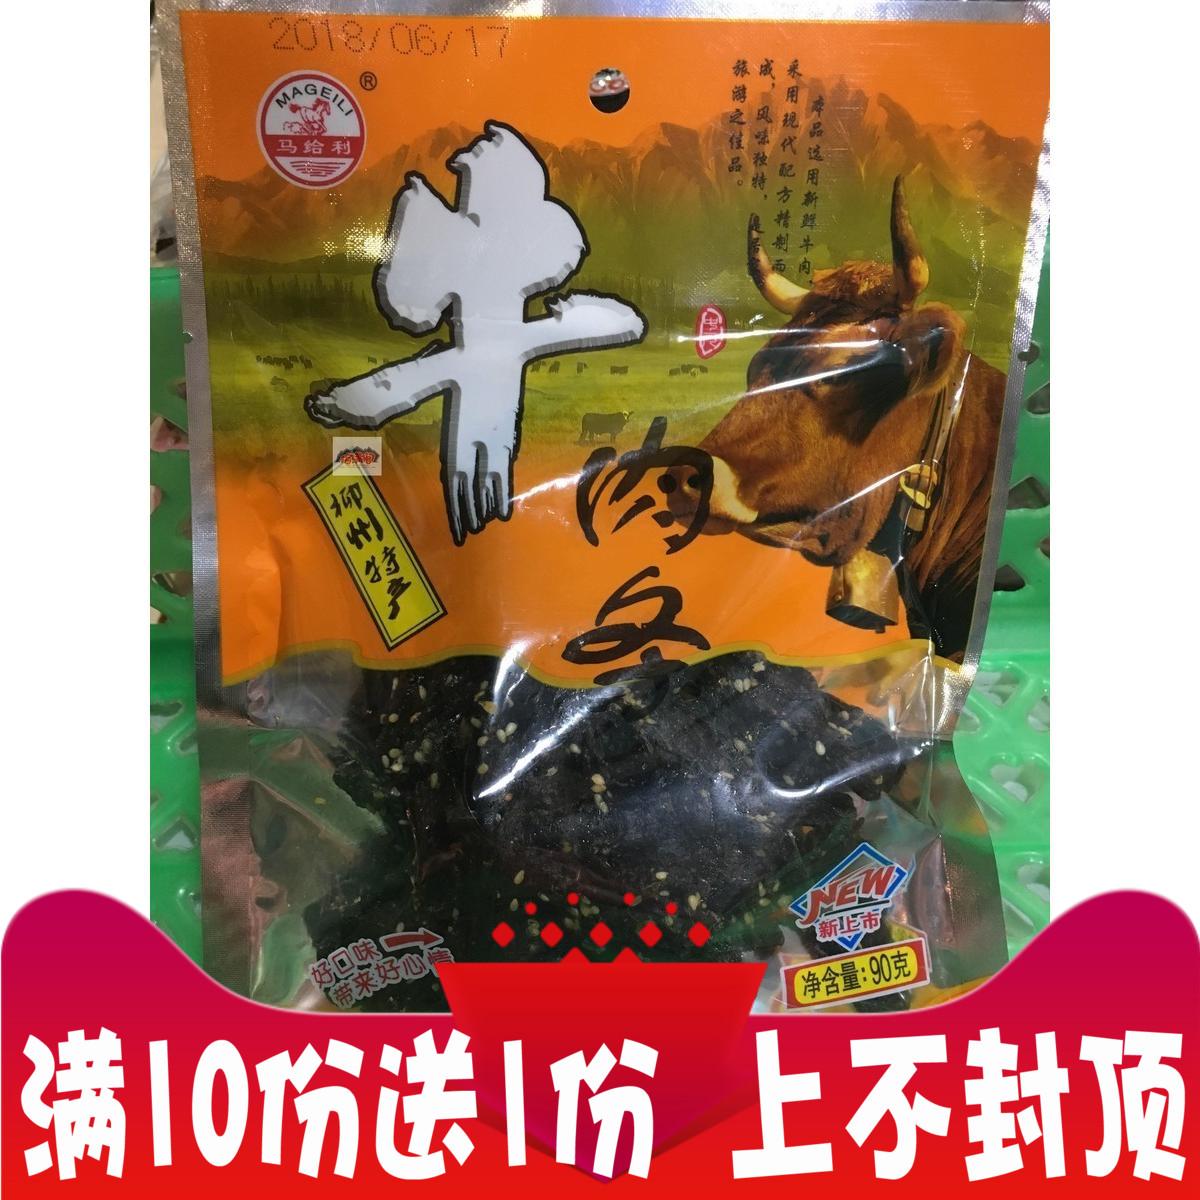 3 pieces of Liuzhou Ma gei Li beef sticks, dried beef, cured beef, dried beef, 90g